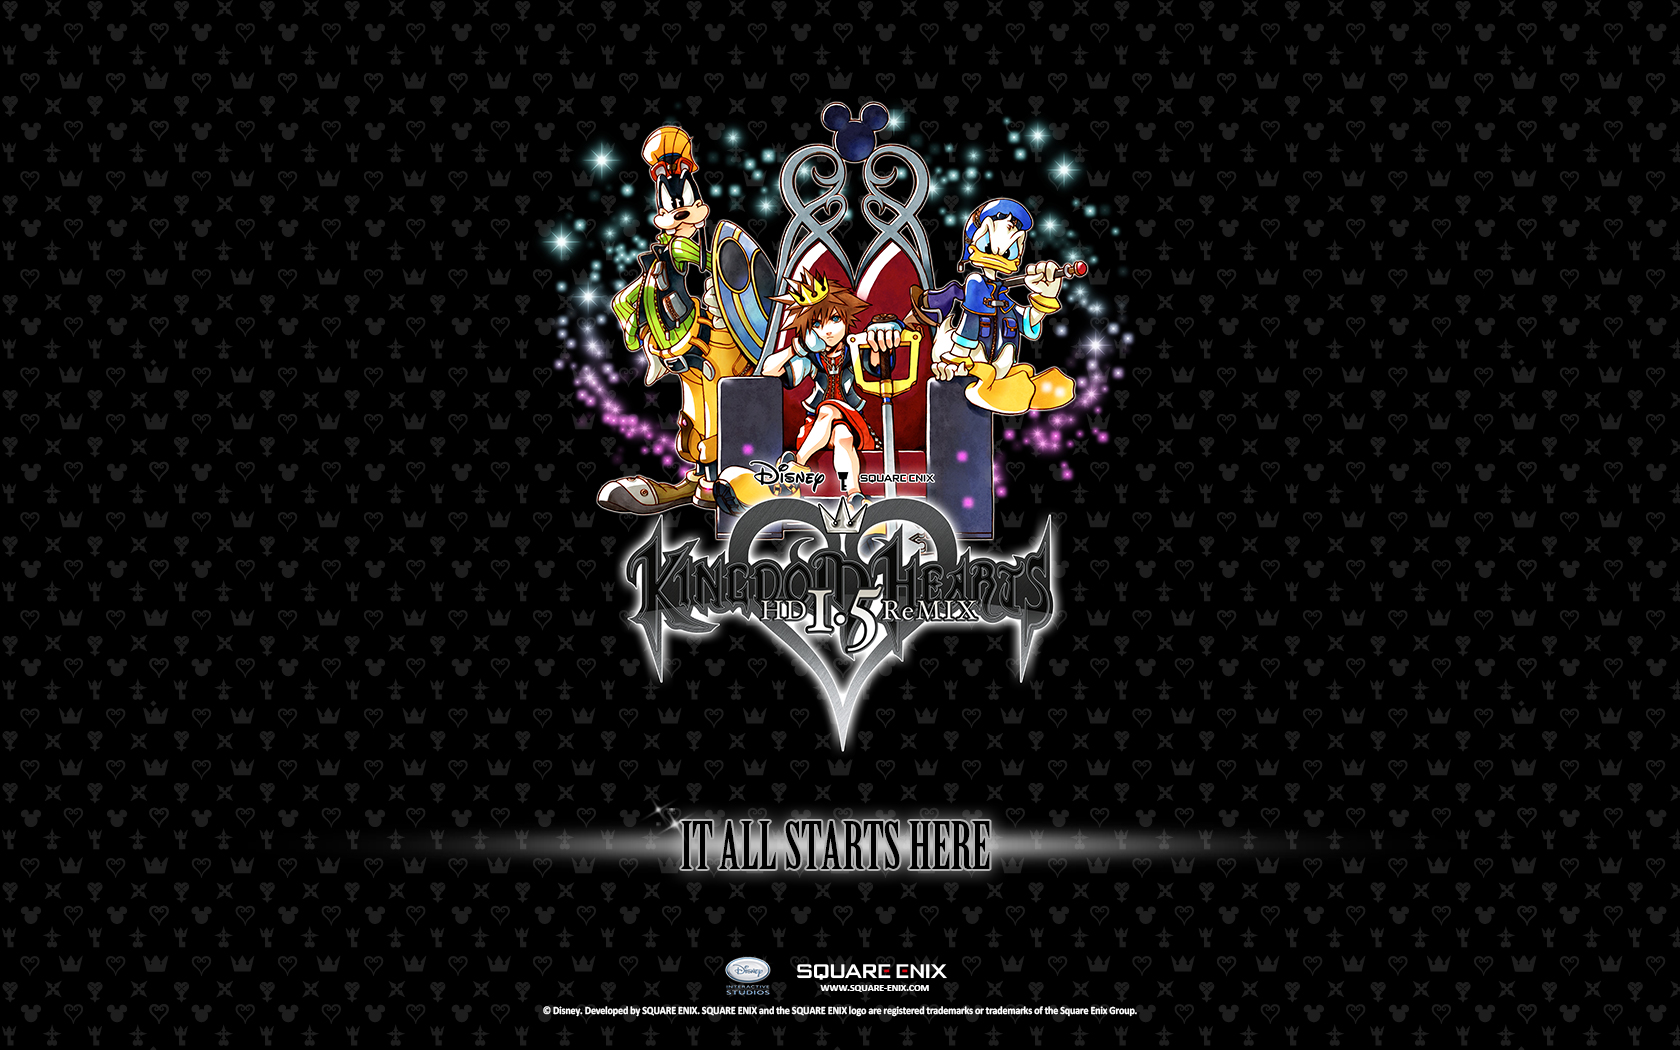 Kingdom Hearts Iphone Wallpaper Two New Kh Hd 1 5 Remix Wallpapers News Kingdom